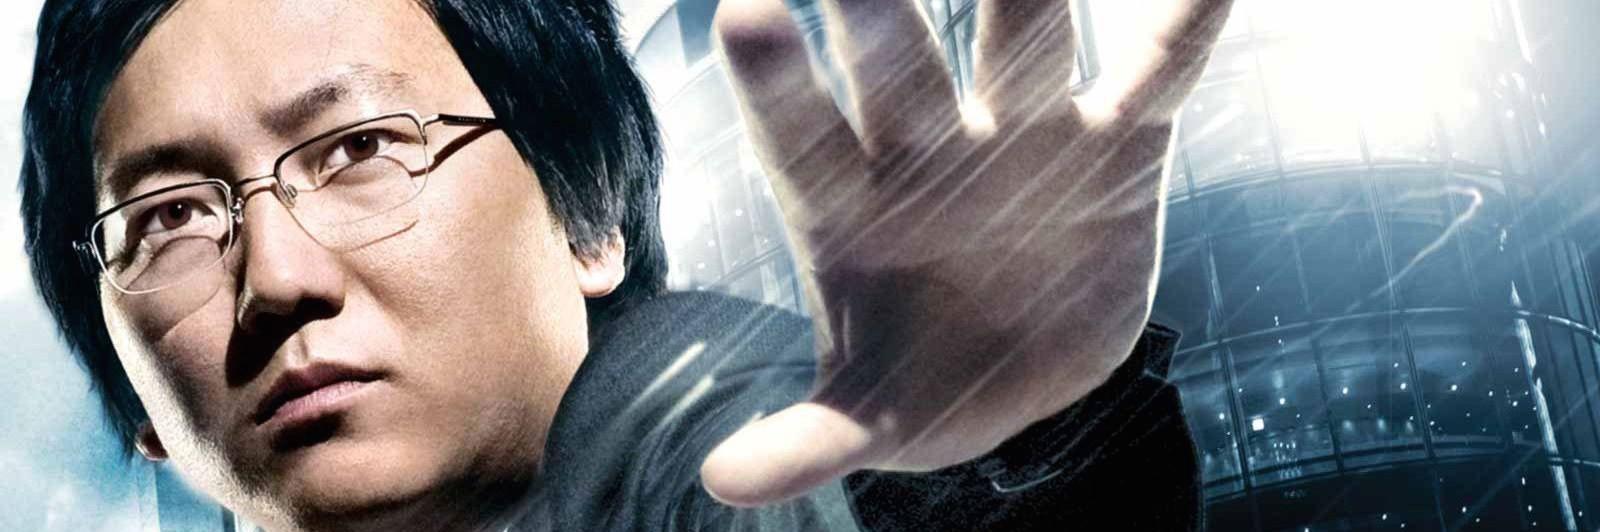 Hiro Nakamura Death Hiro Nakamura in a